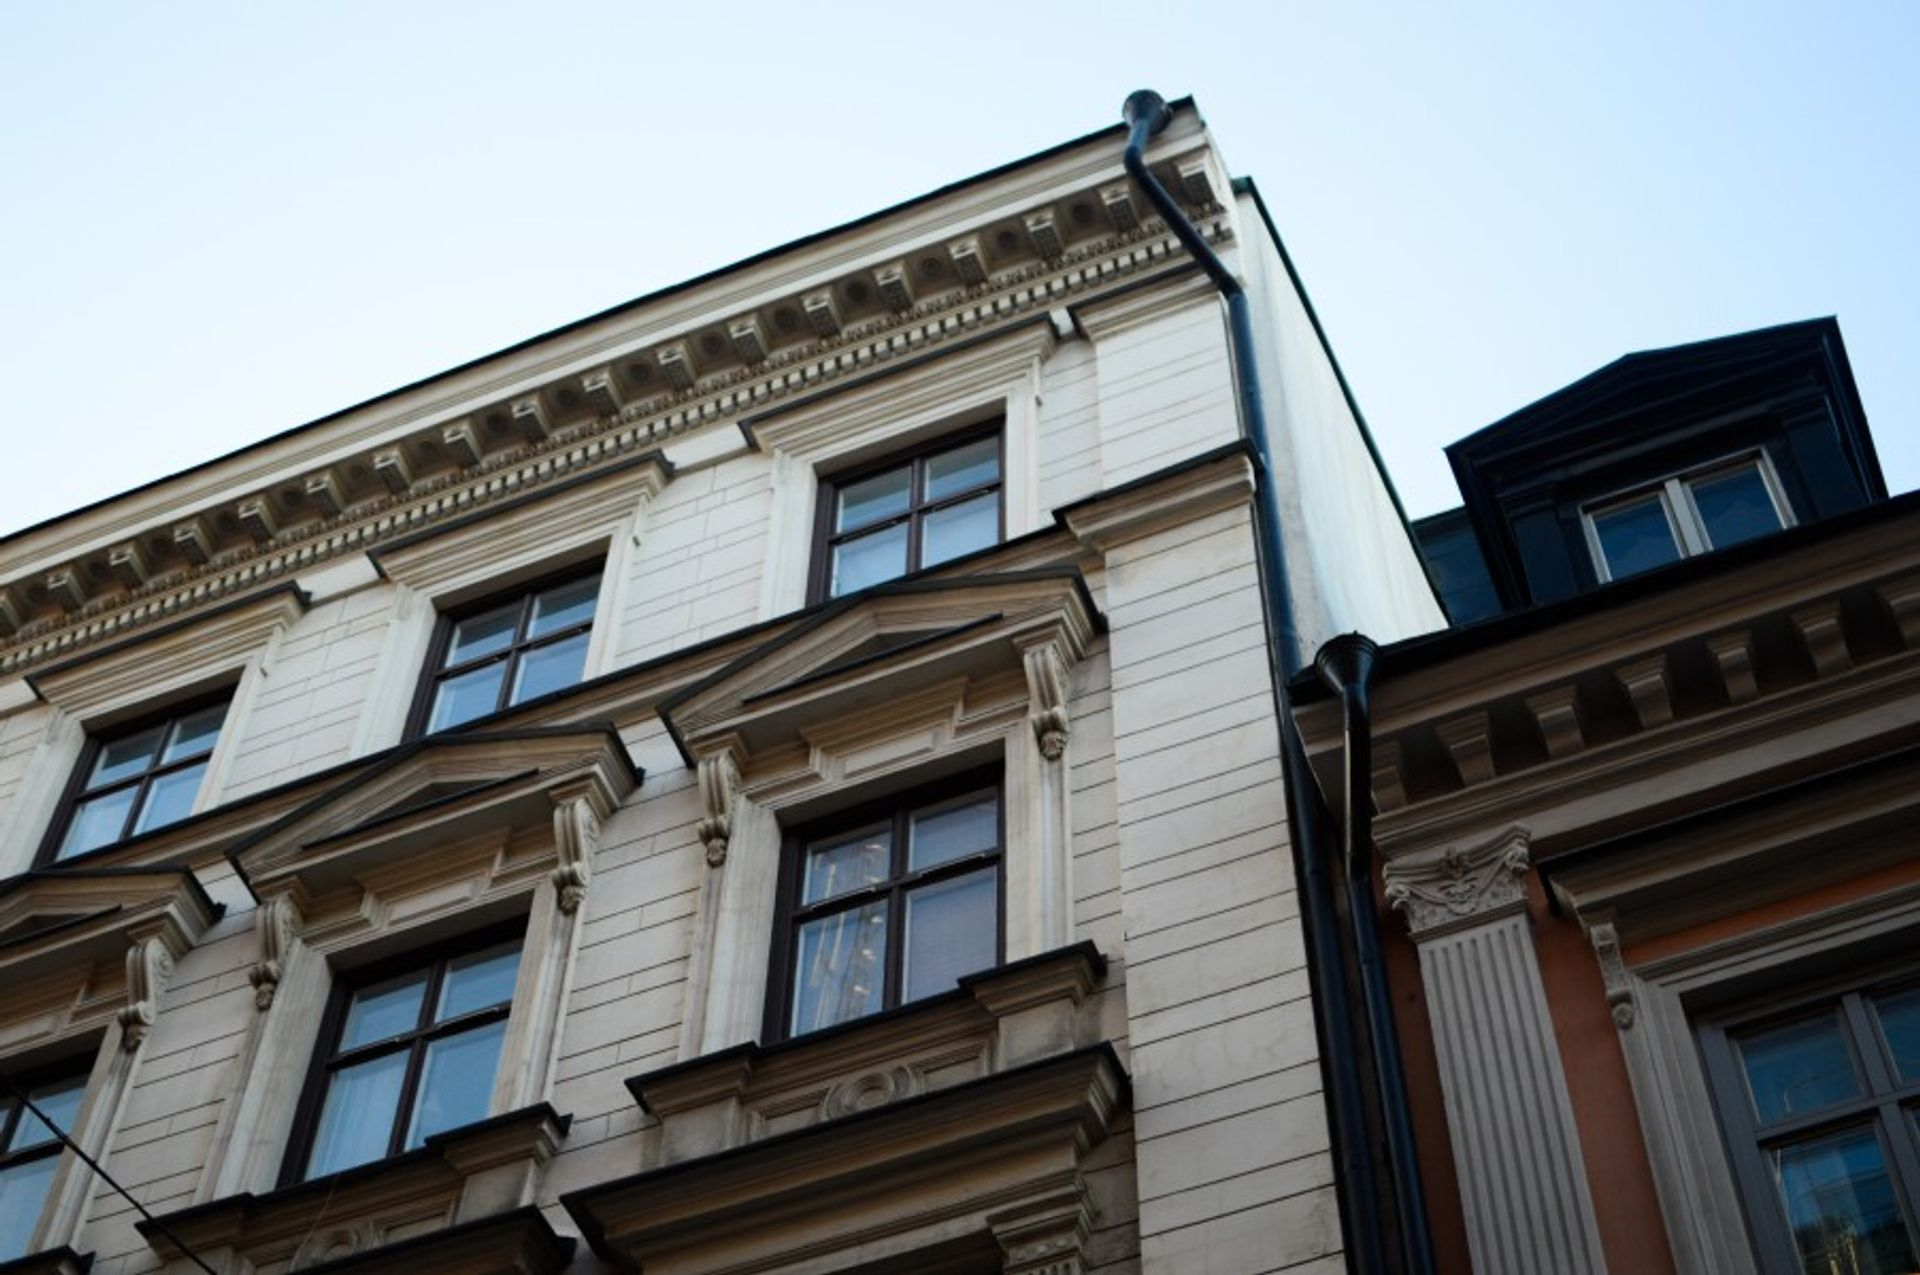 Exterior of an apartment building.